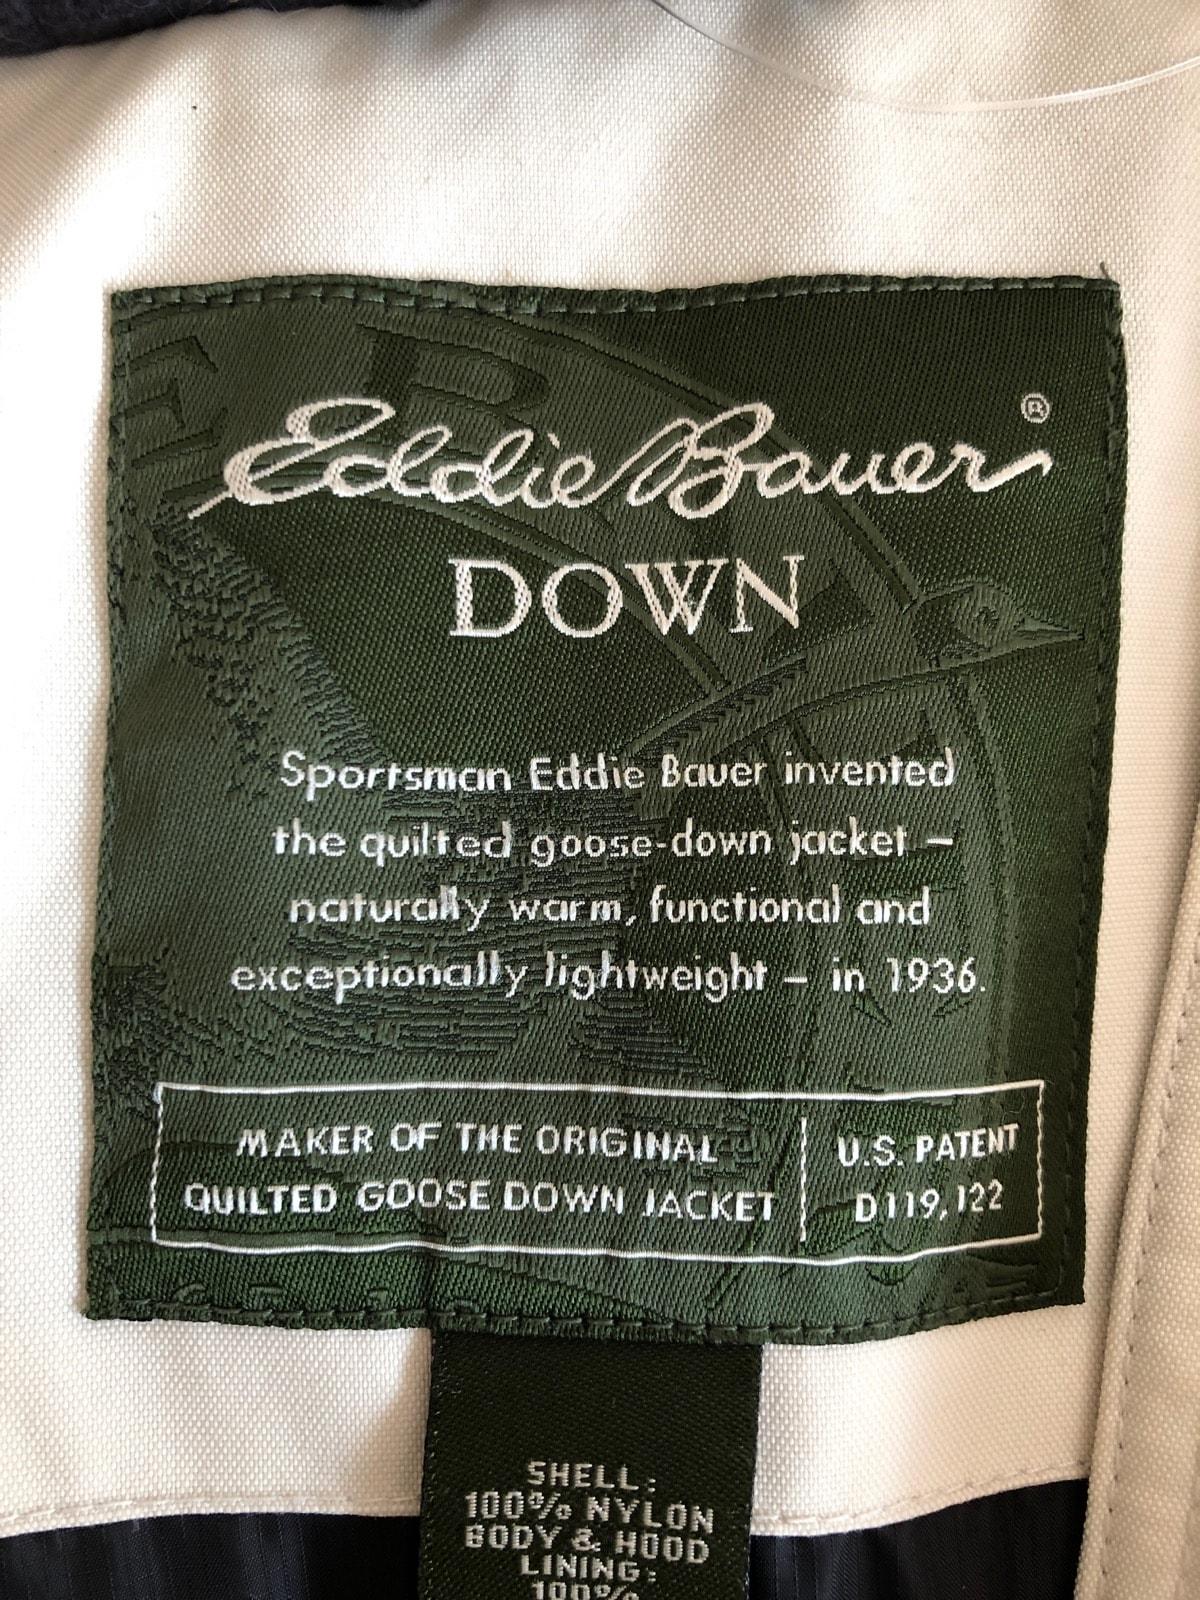 Eddie Bauer(エディバウアー)のダウンコート